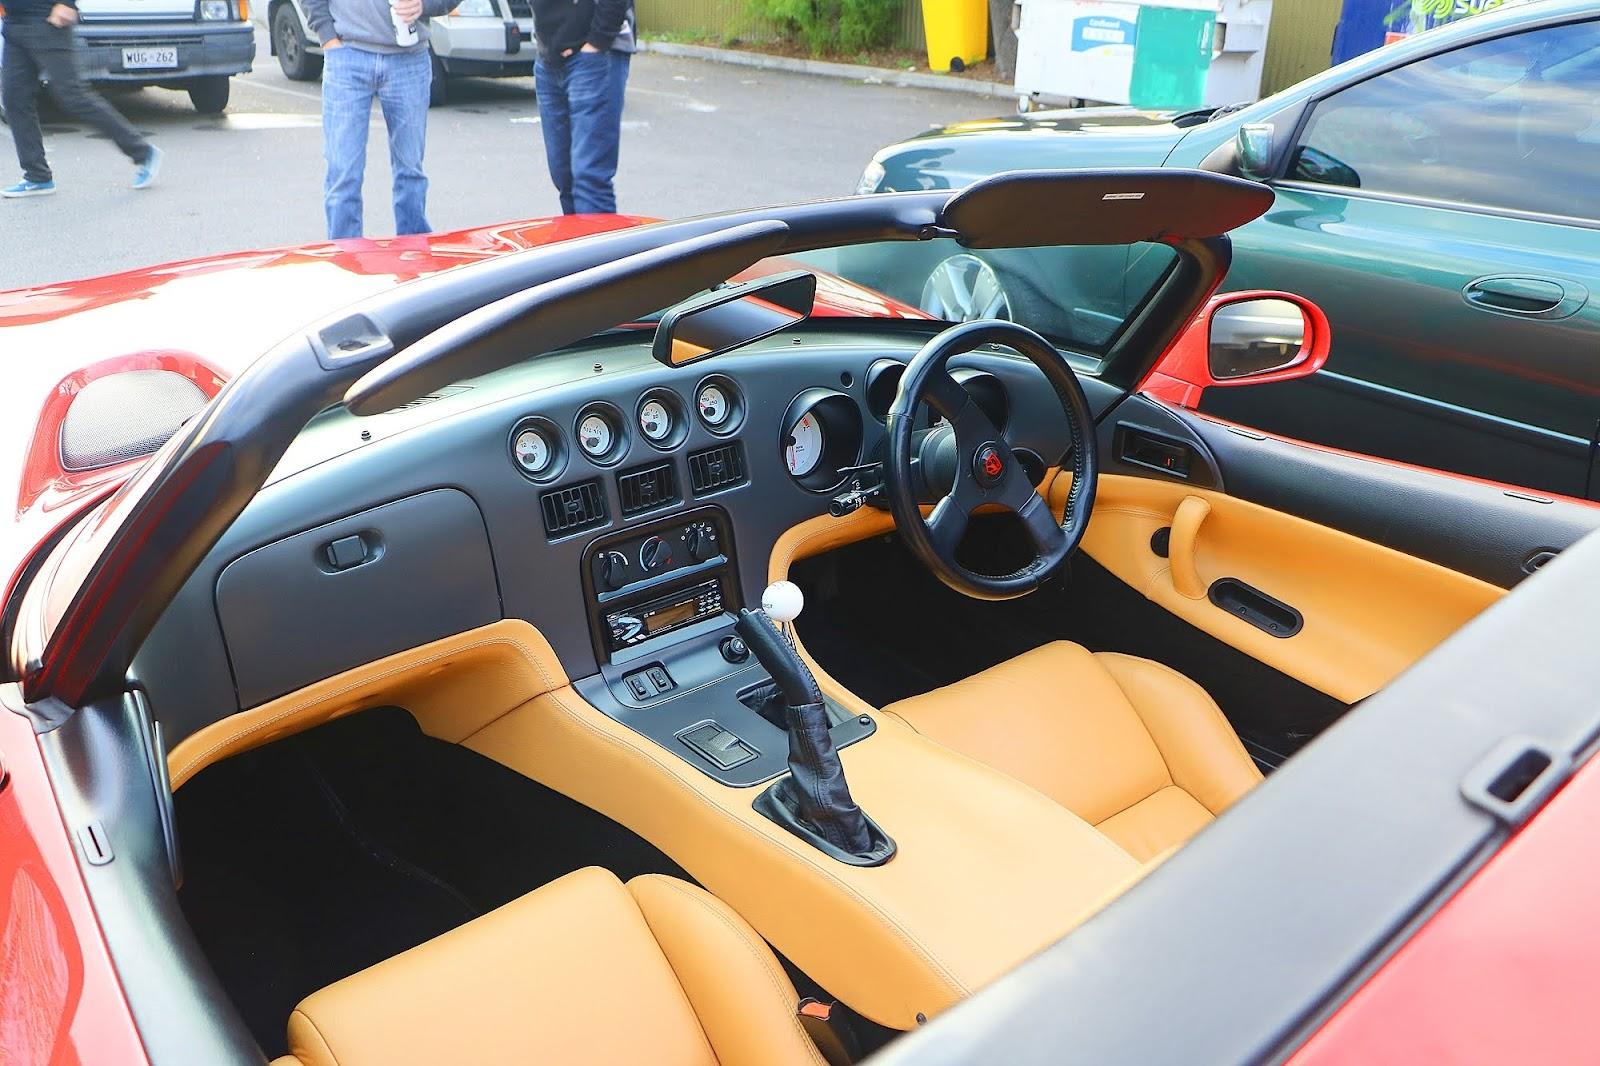 1993 Dodge Viper Interior Left.jpg